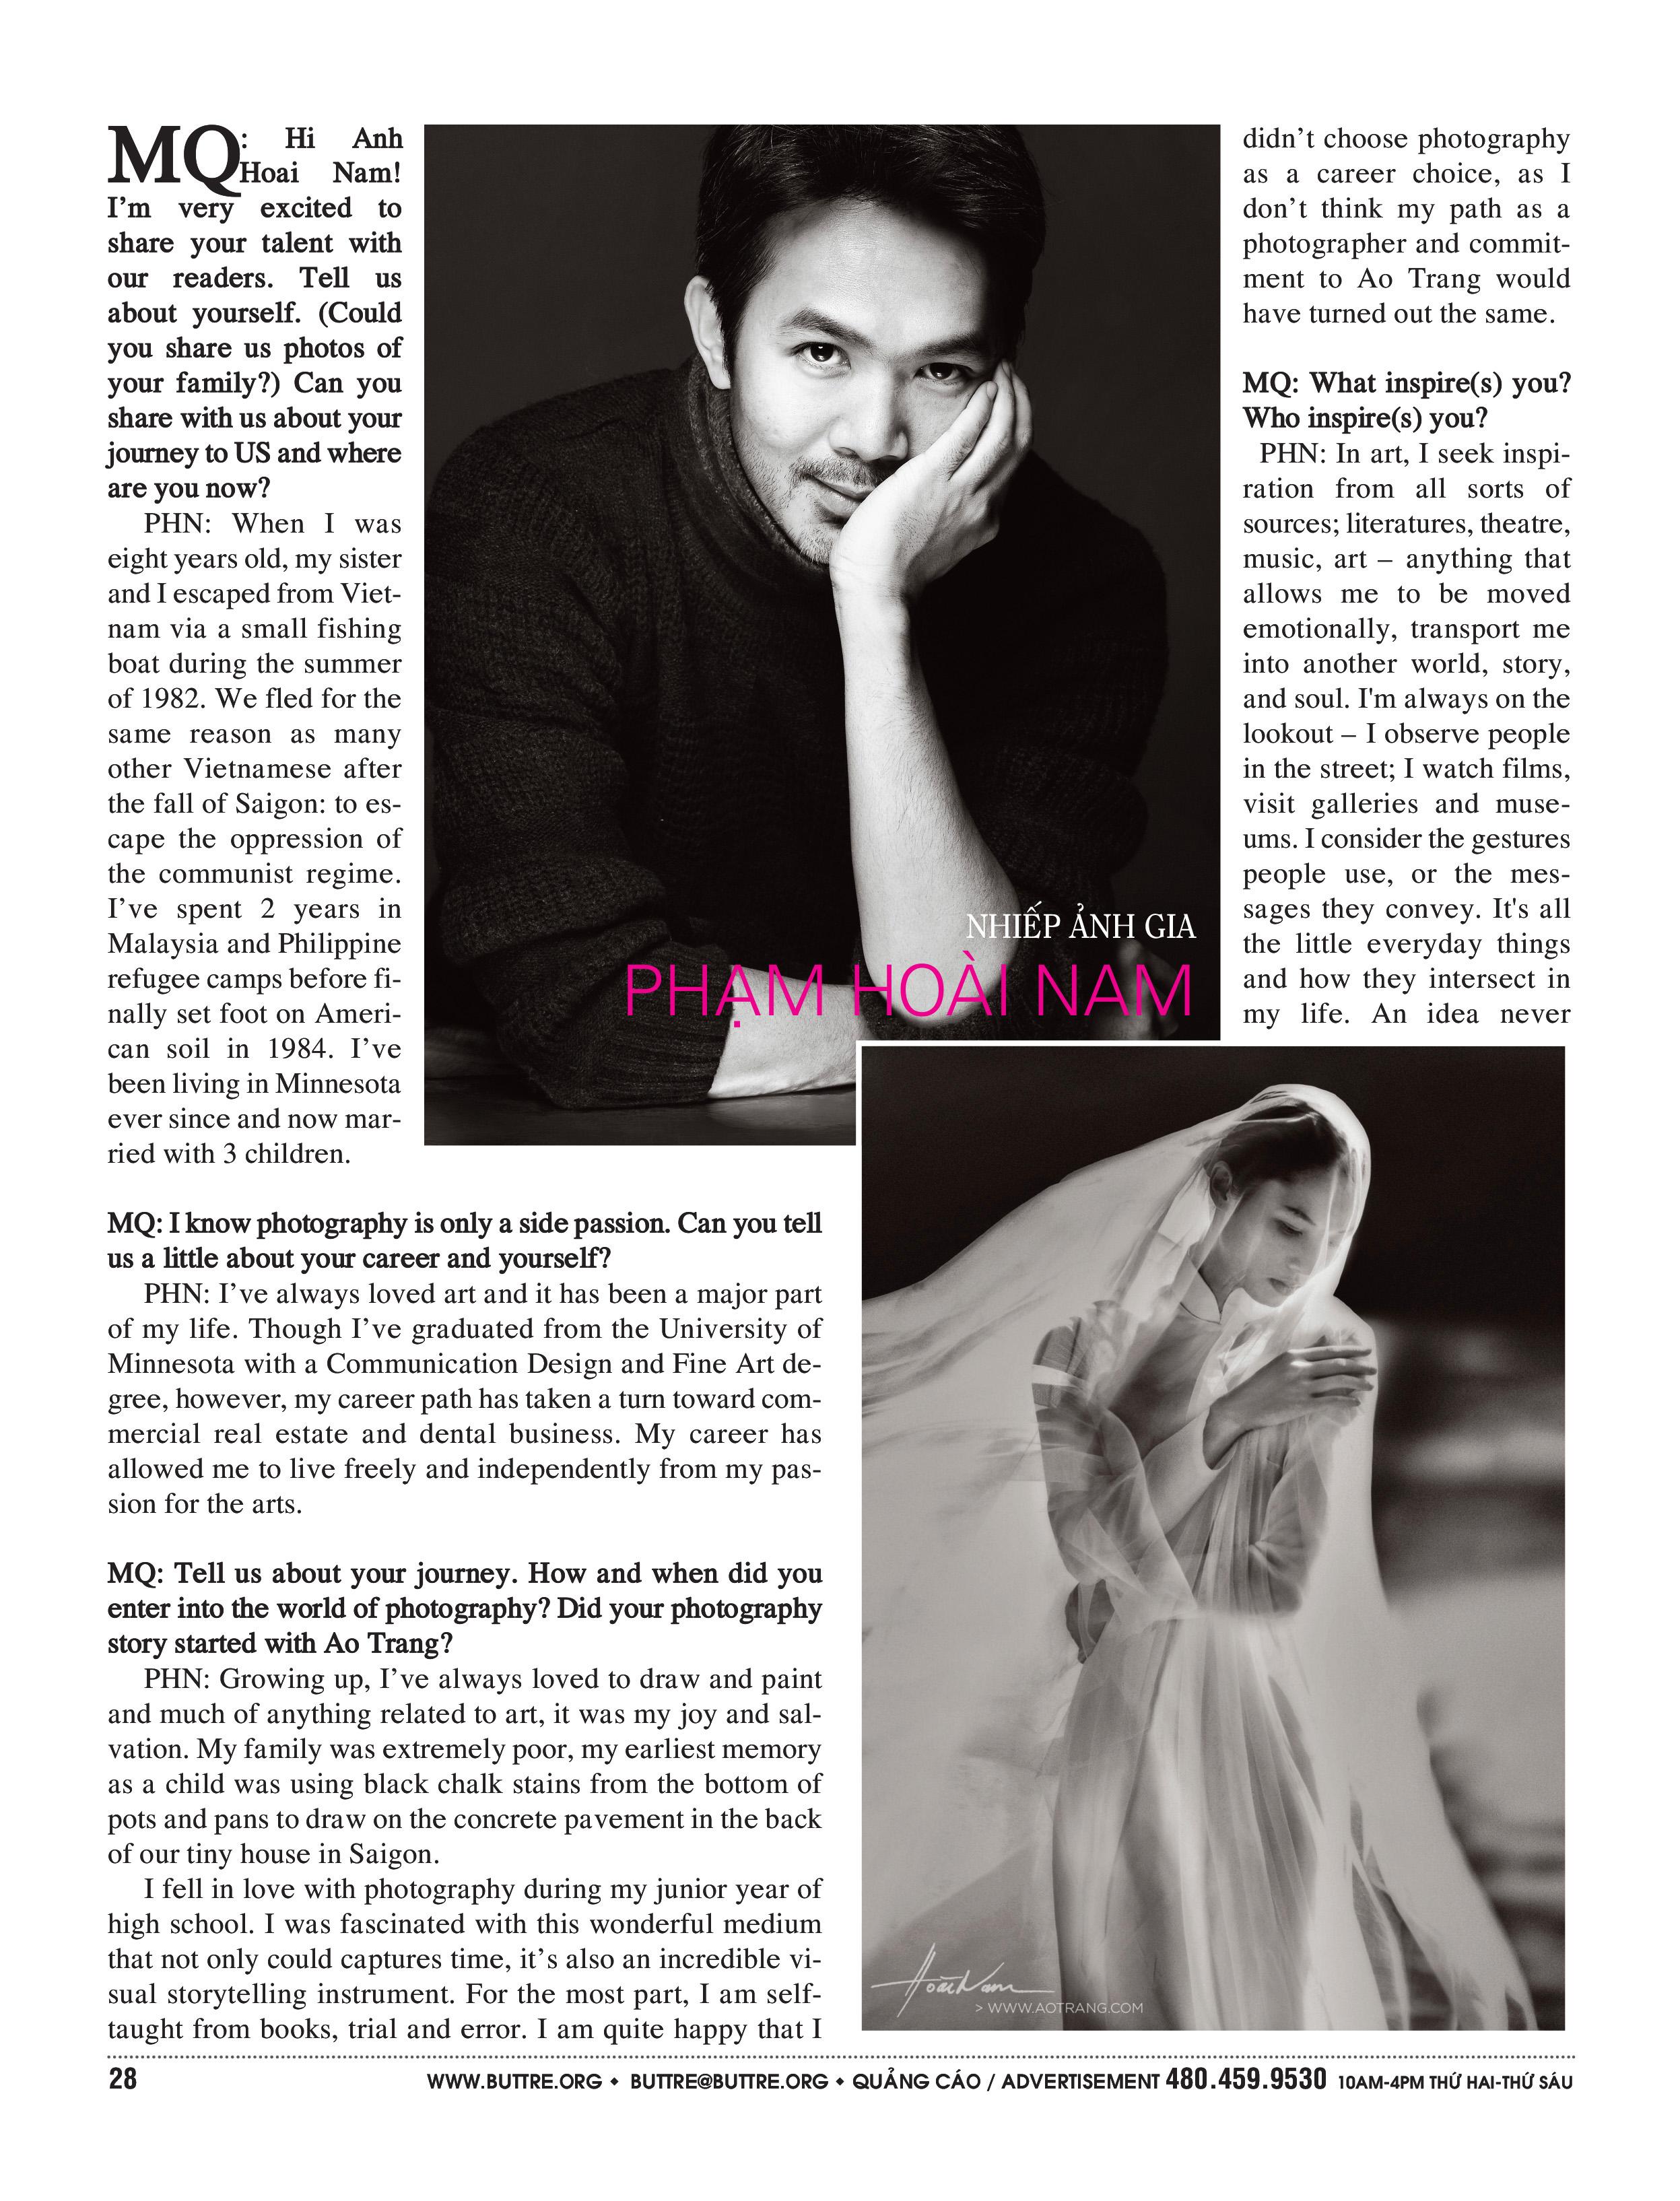 Pham-Hoai-Nam-But-Tre-Interview March 2018-2.jpg